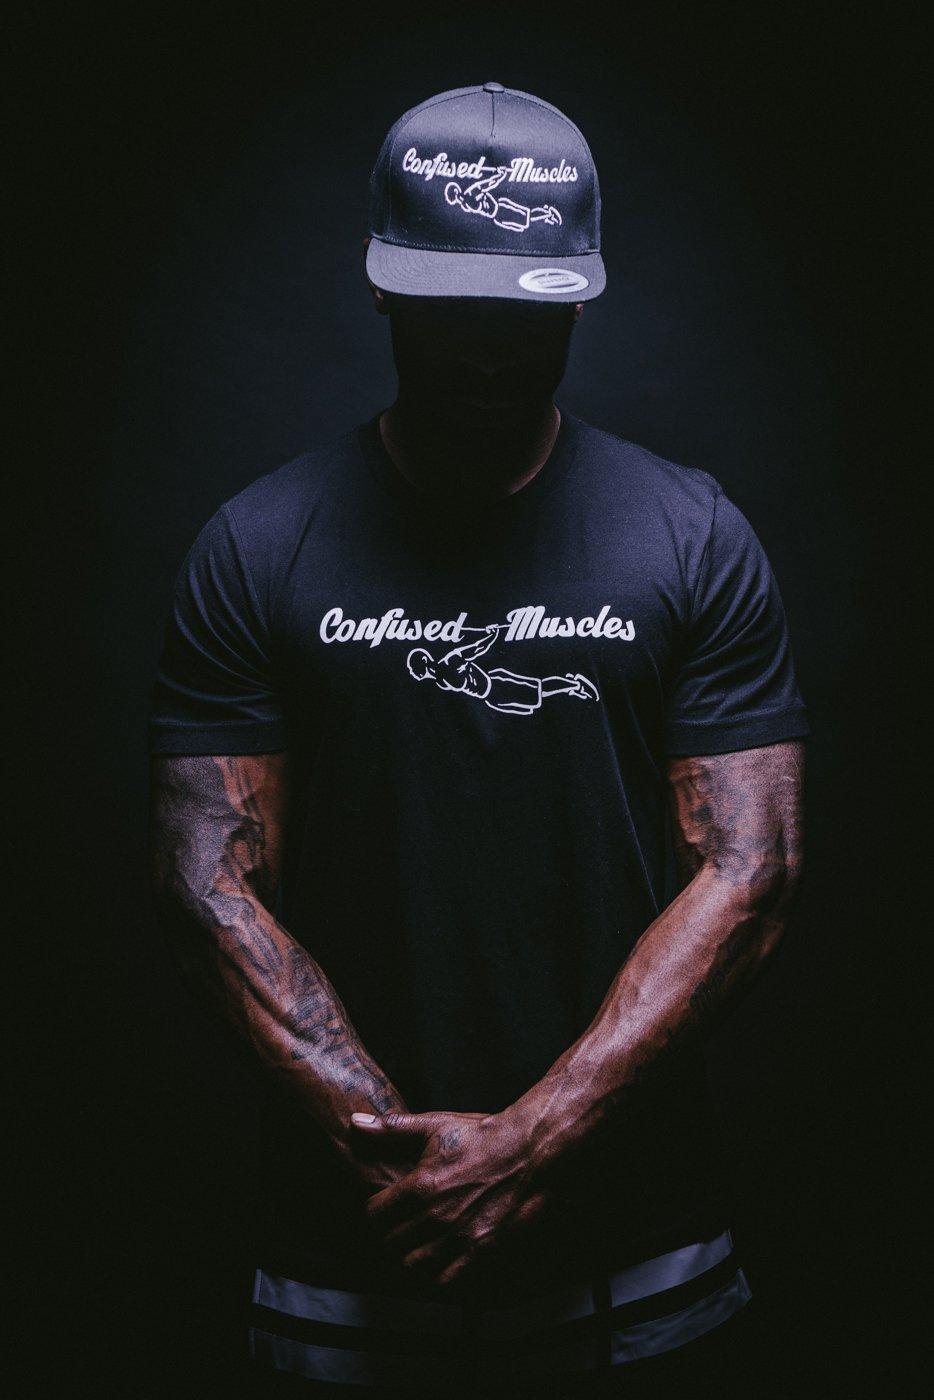 Image of CM T-shirt